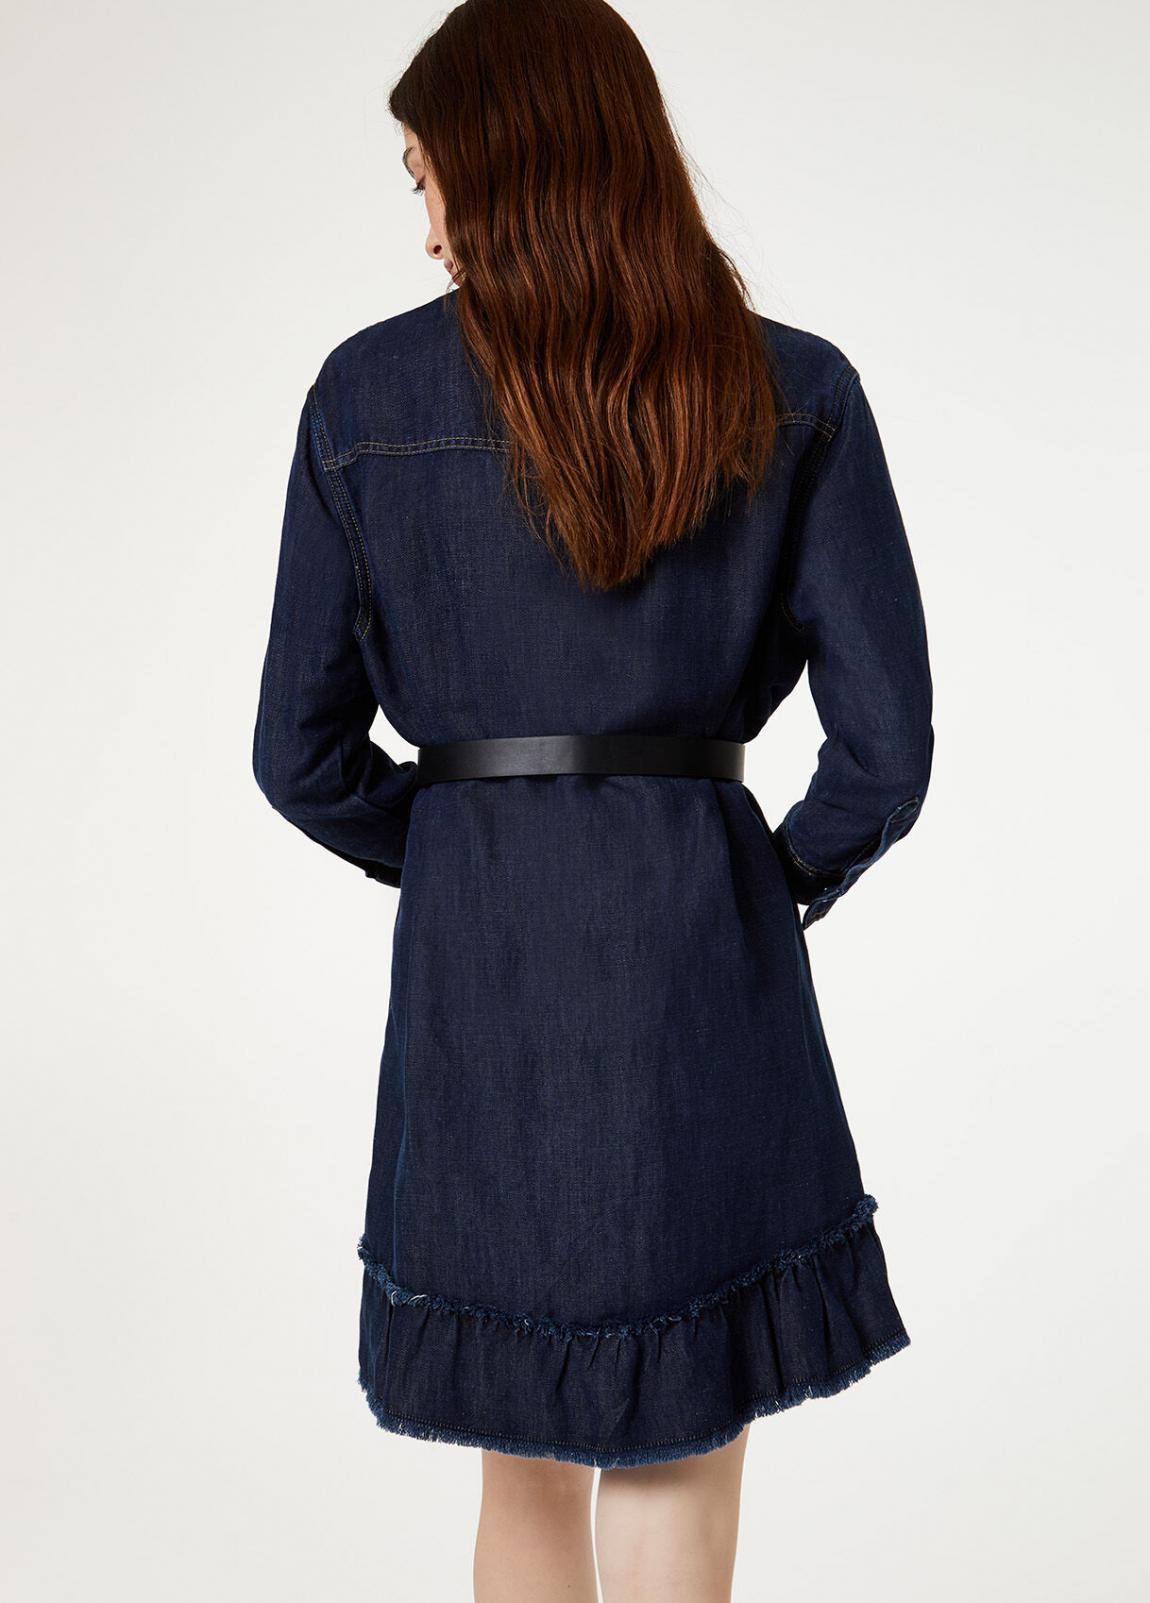 Damen Jeanskleid Mit Gürtel  Liu Jo Kleider — Pax Domini